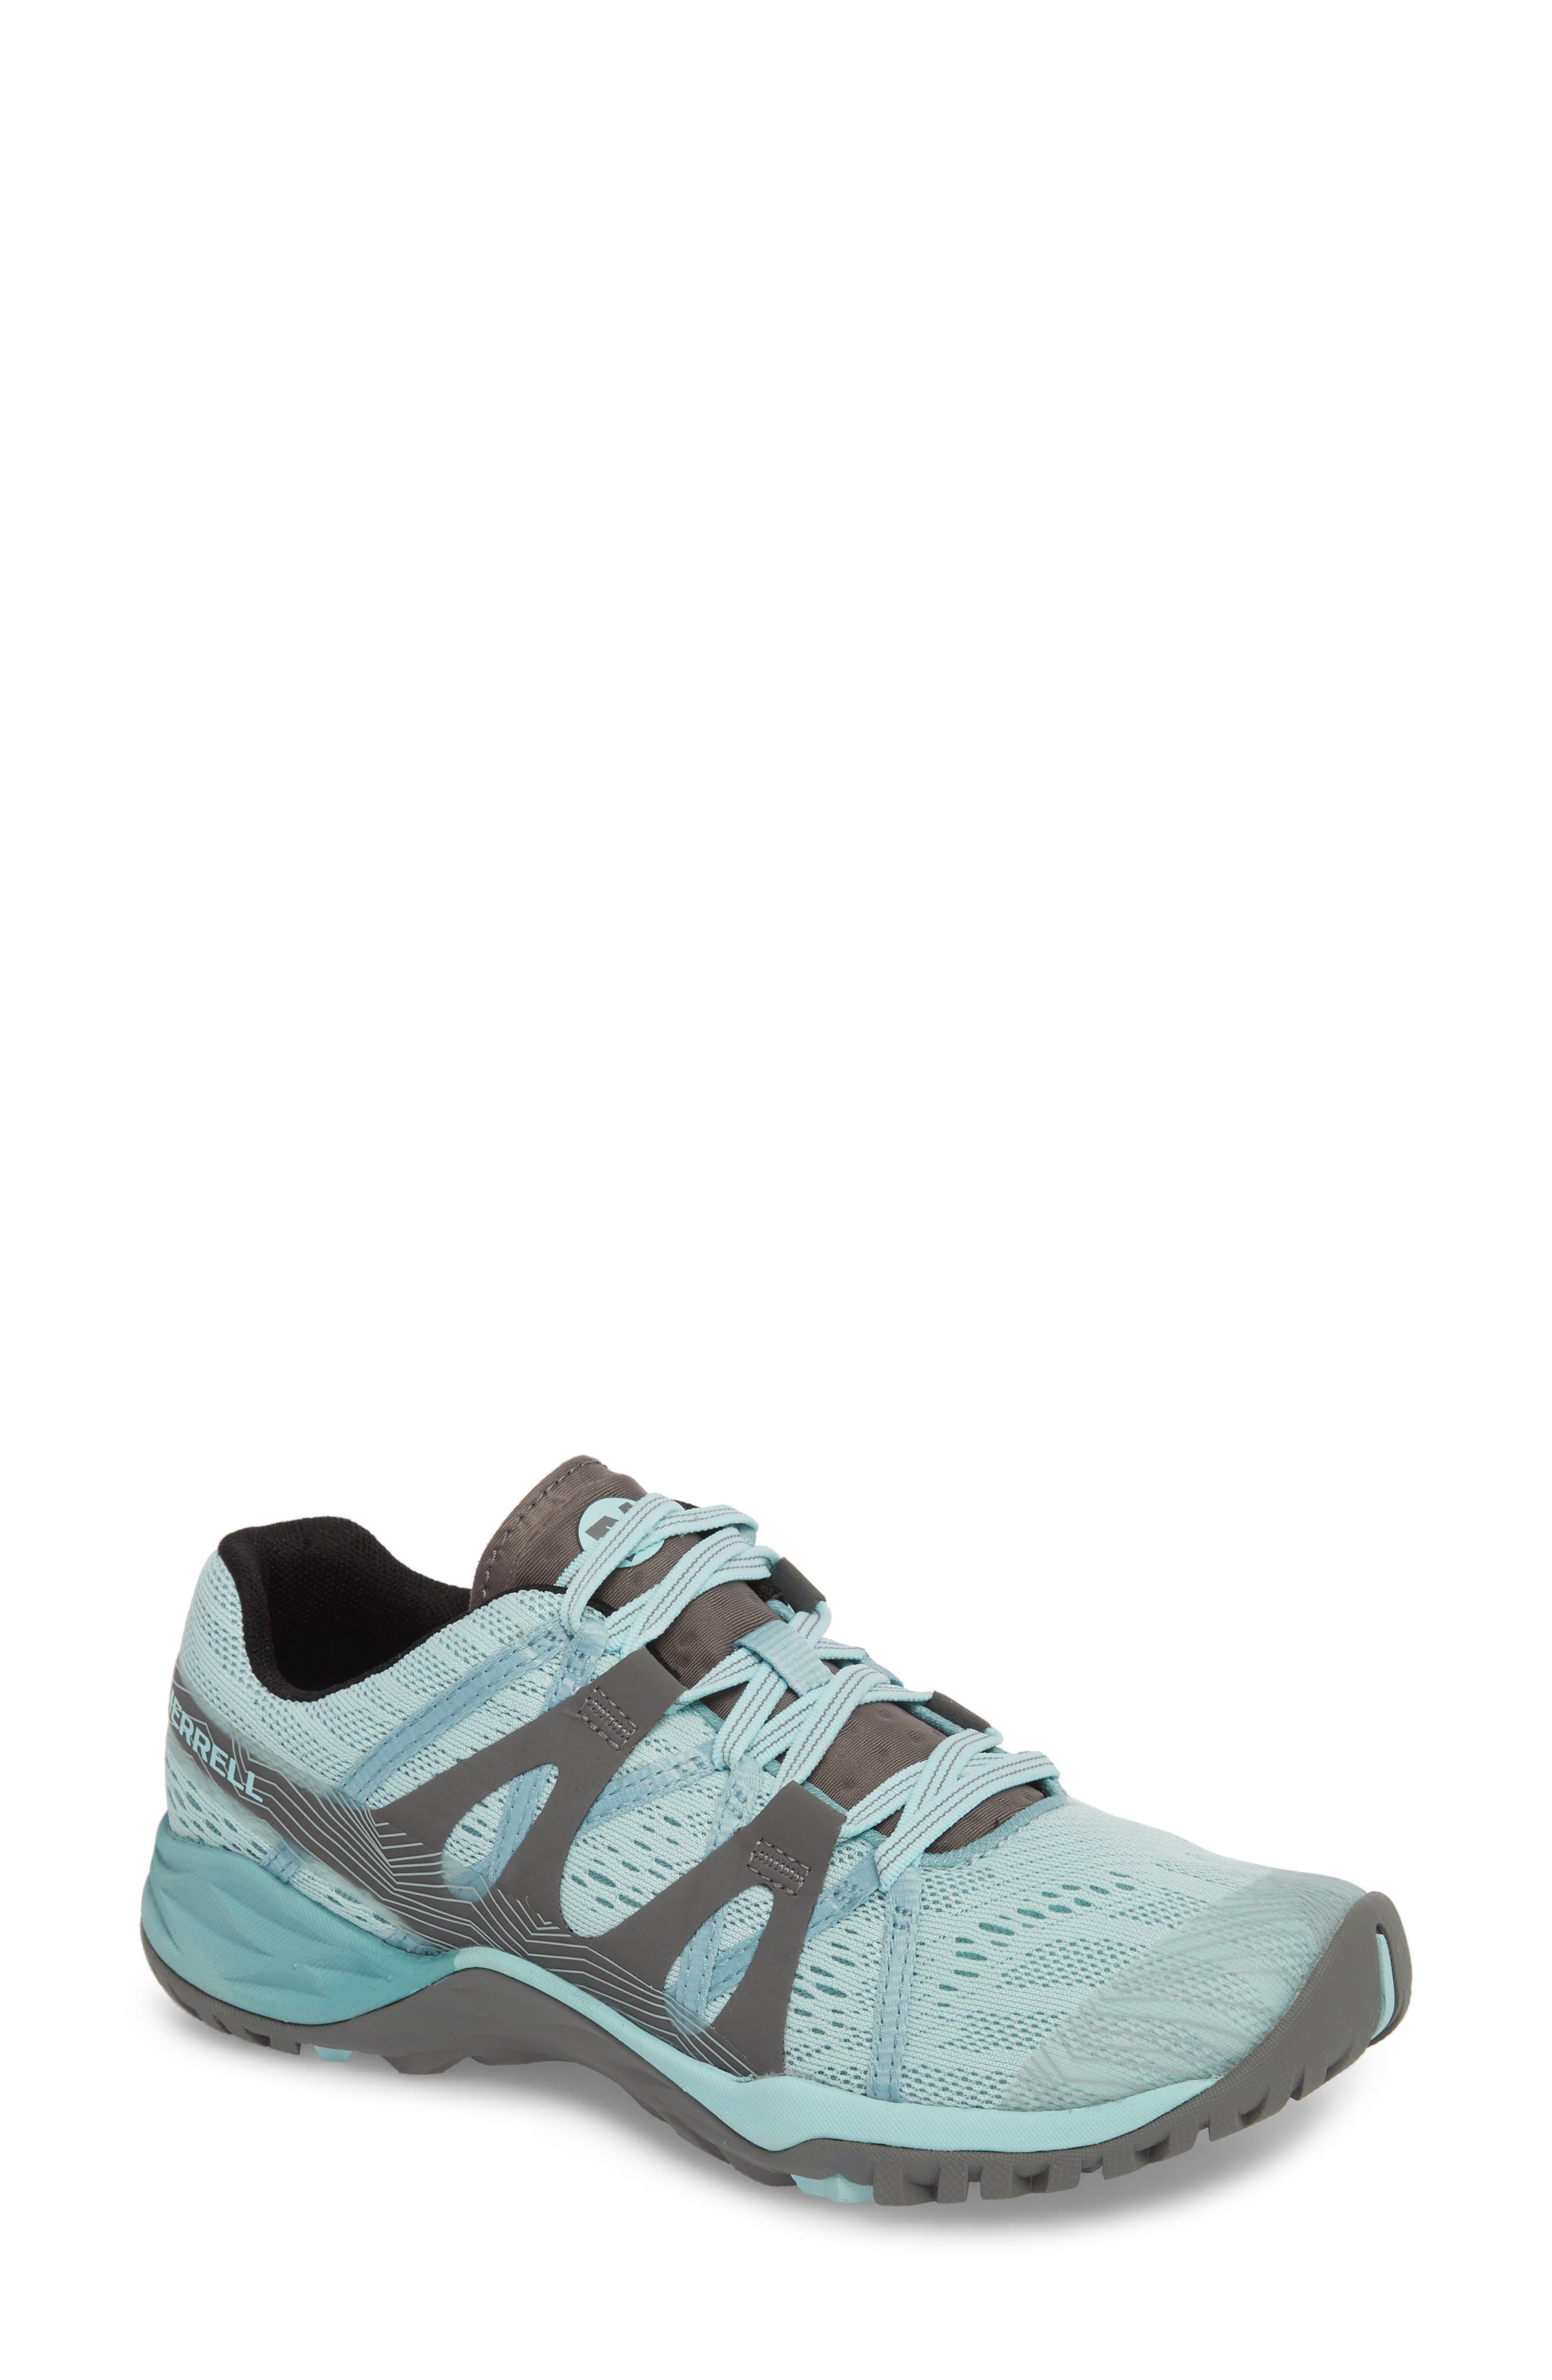 Siren Hex Sneaker,                             Main thumbnail 1, color,                             Bleached Aqua